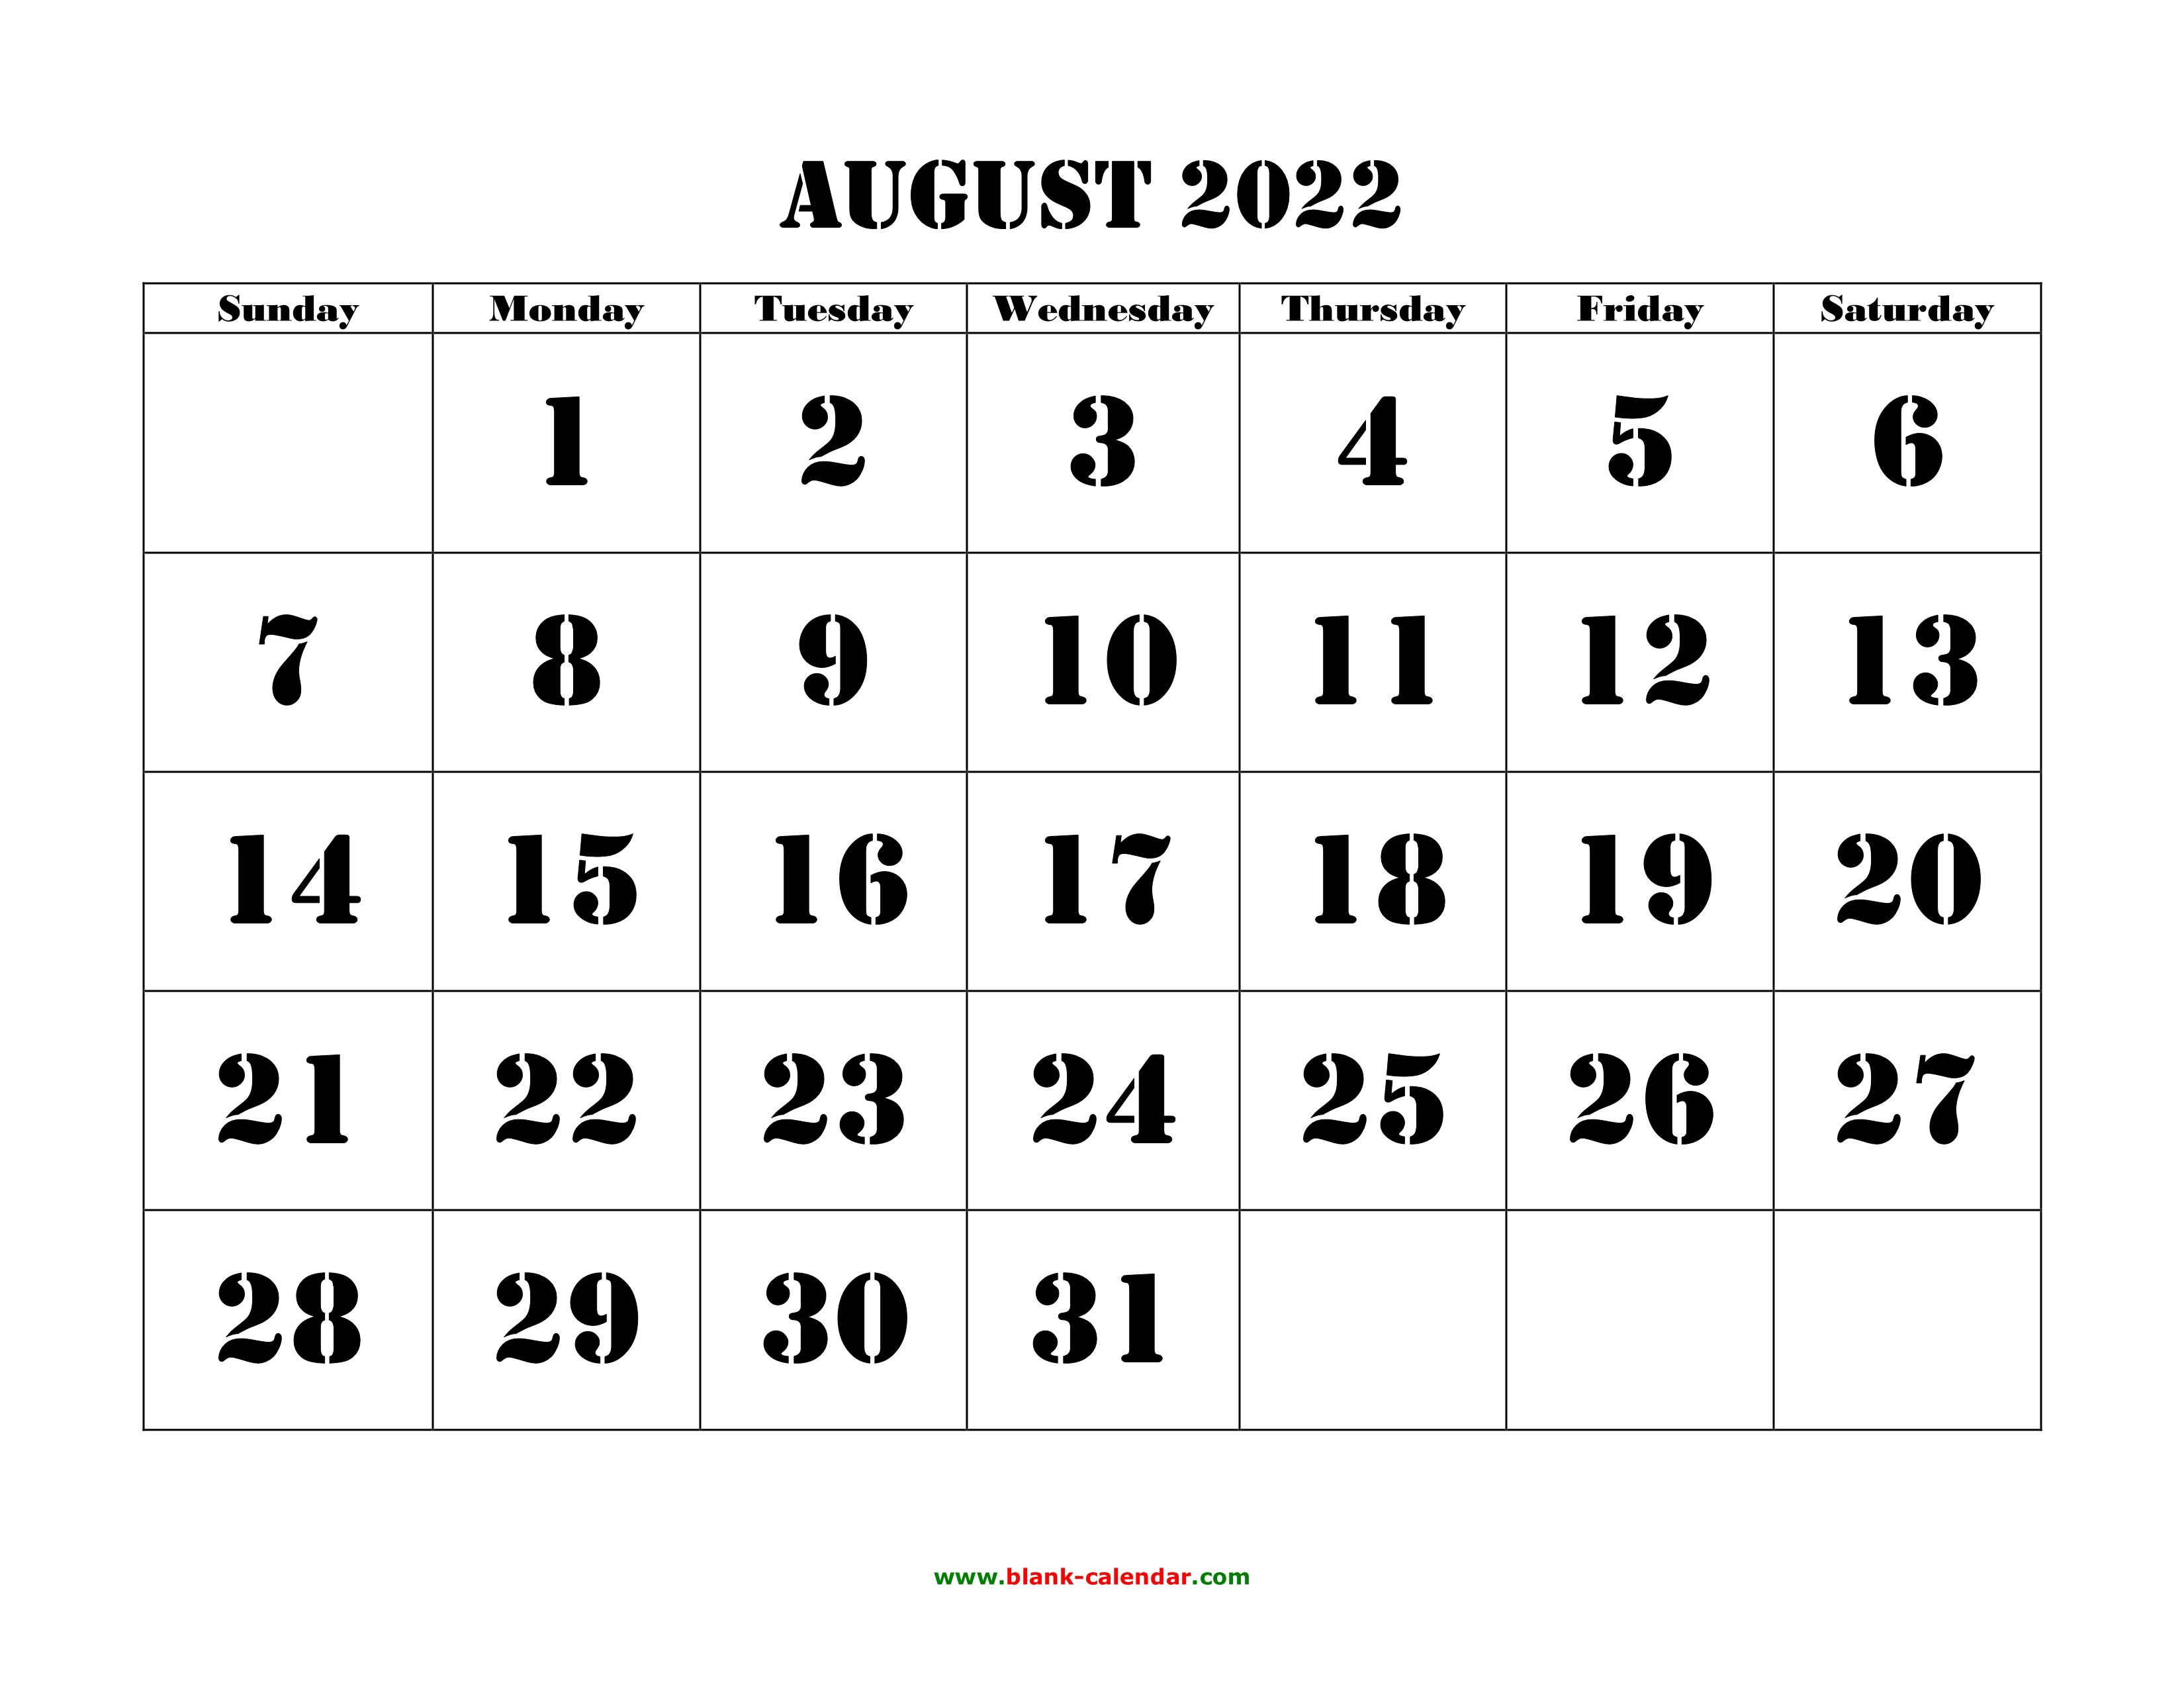 August 2022 Calendar.Free Download Printable August 2022 Calendar Large Font Design Holidays On Red